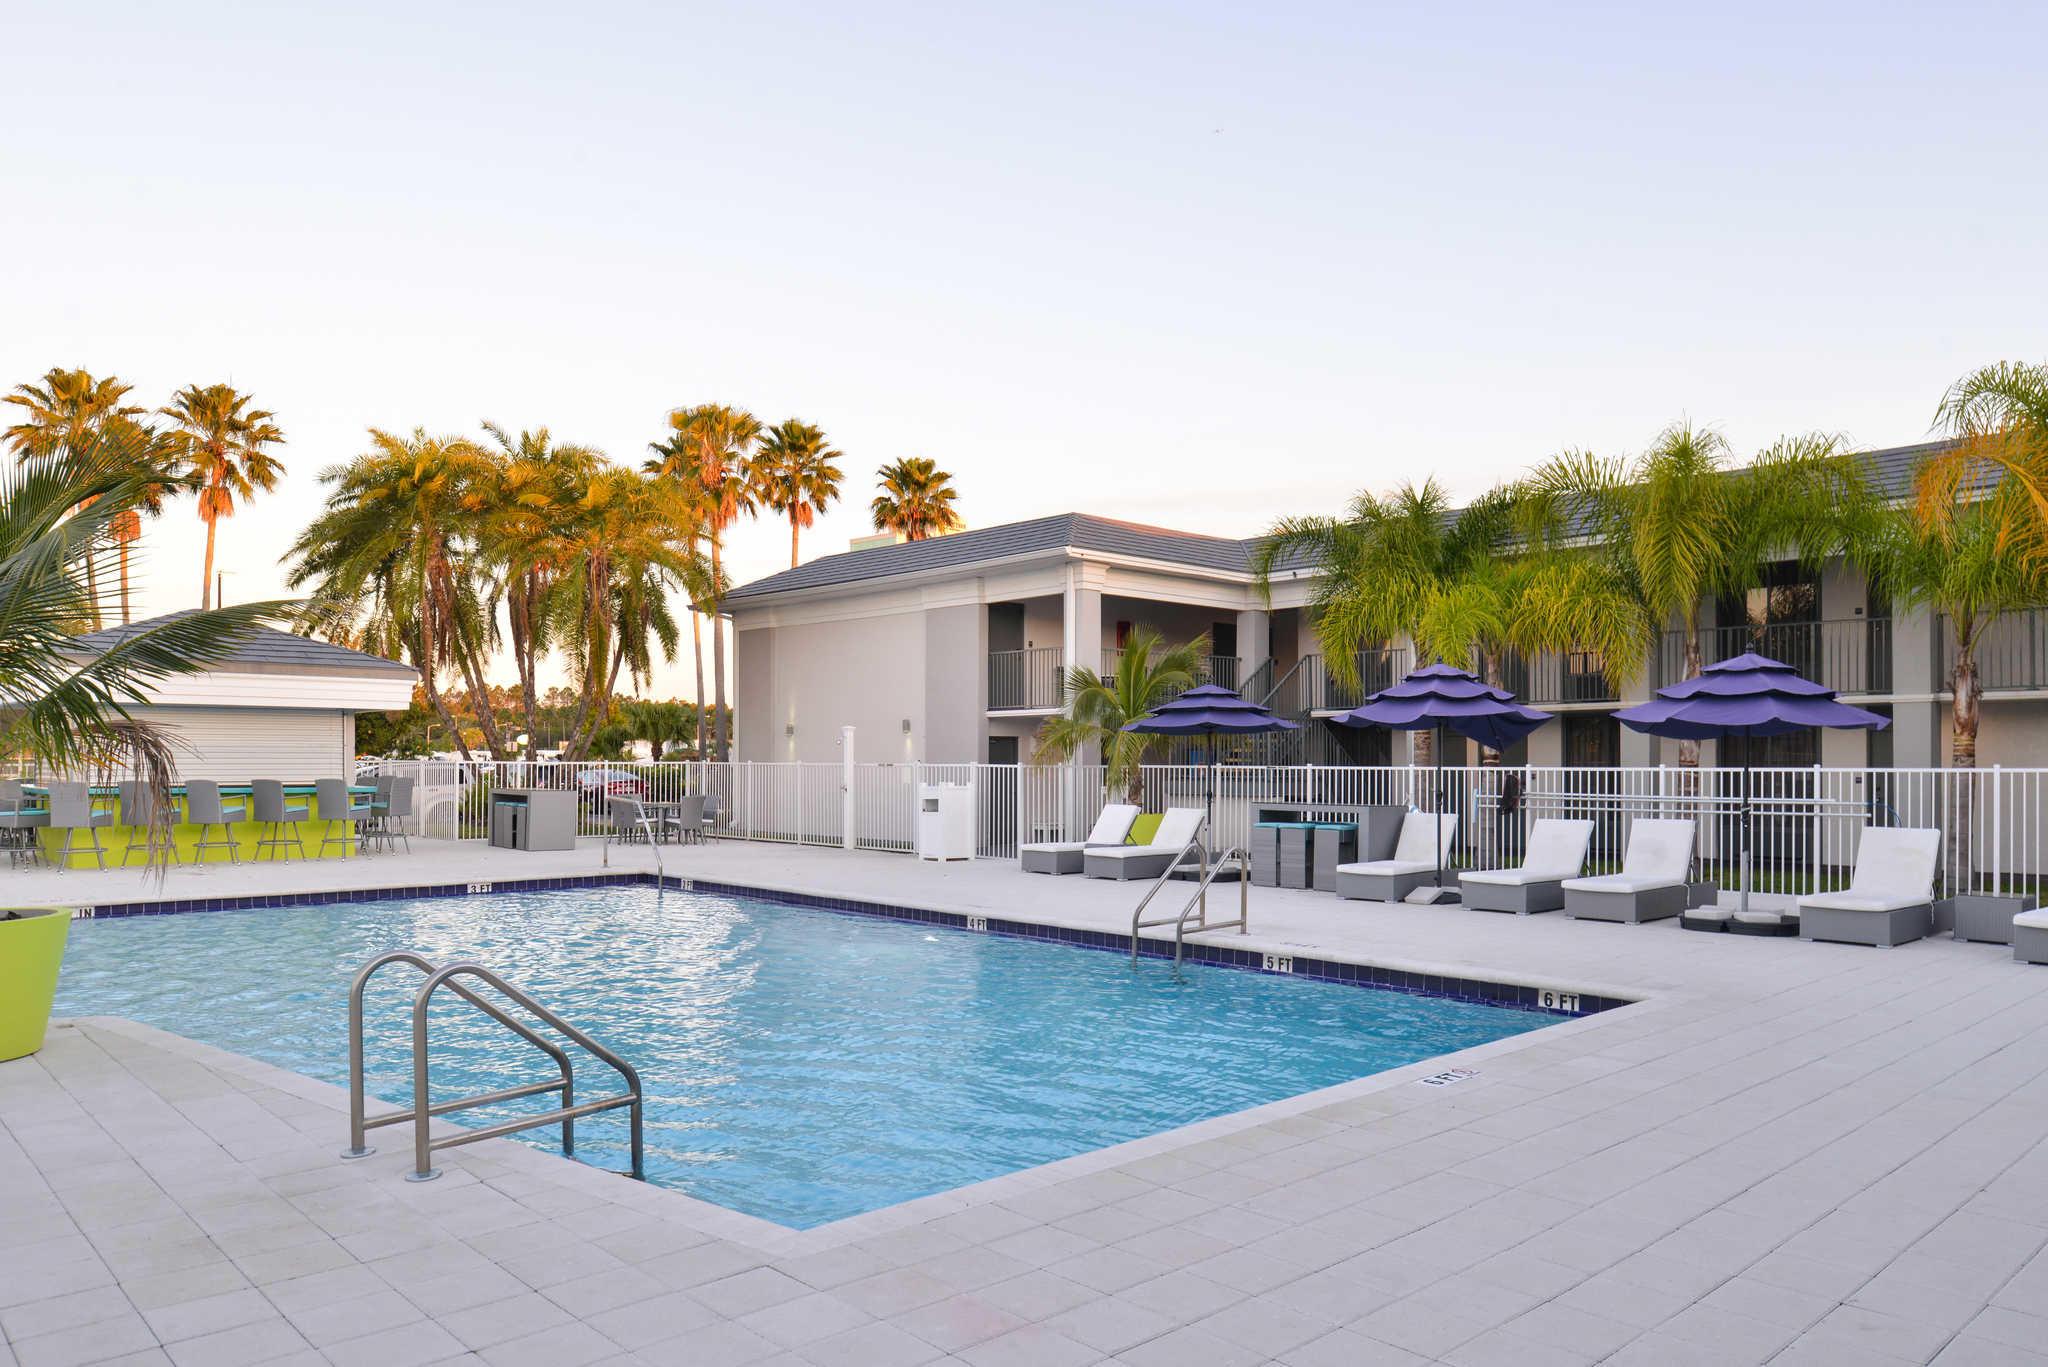 Clarion Inn & Suites Orlando near Theme Parks image 21